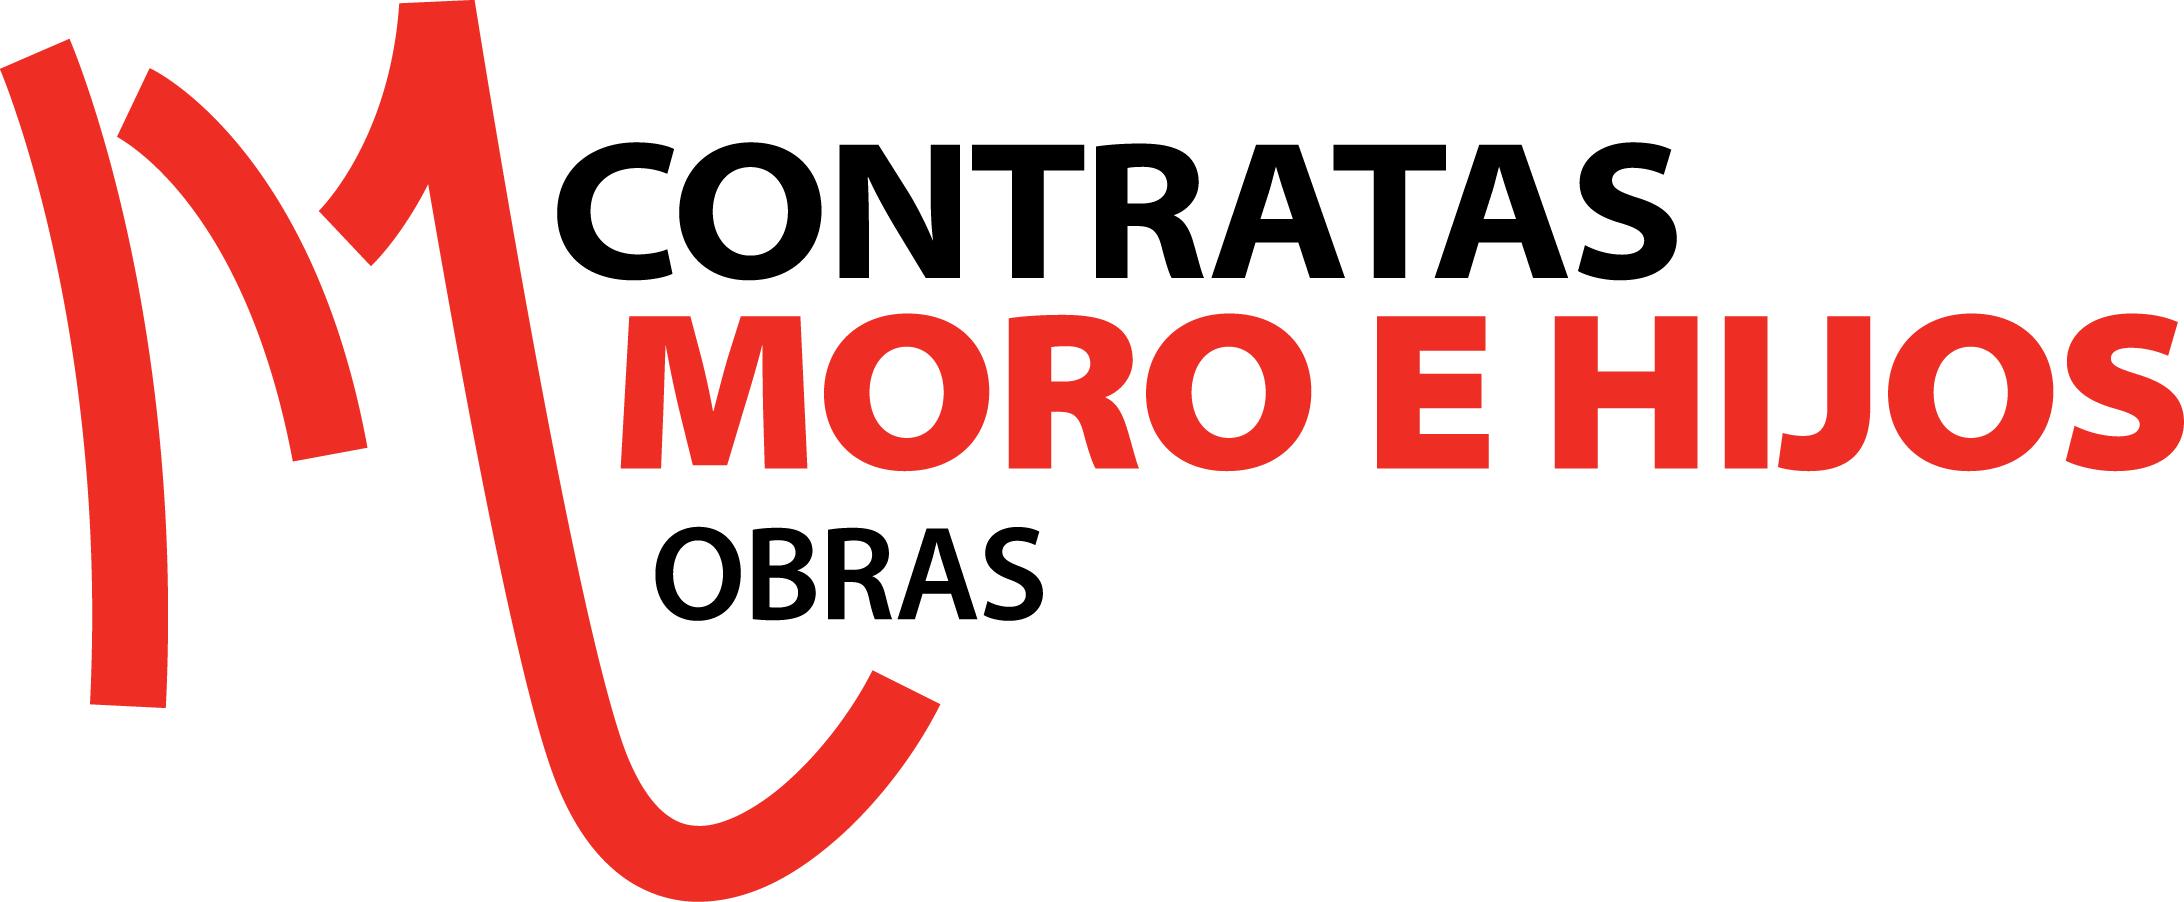 Contratas Moro e hijos s.l